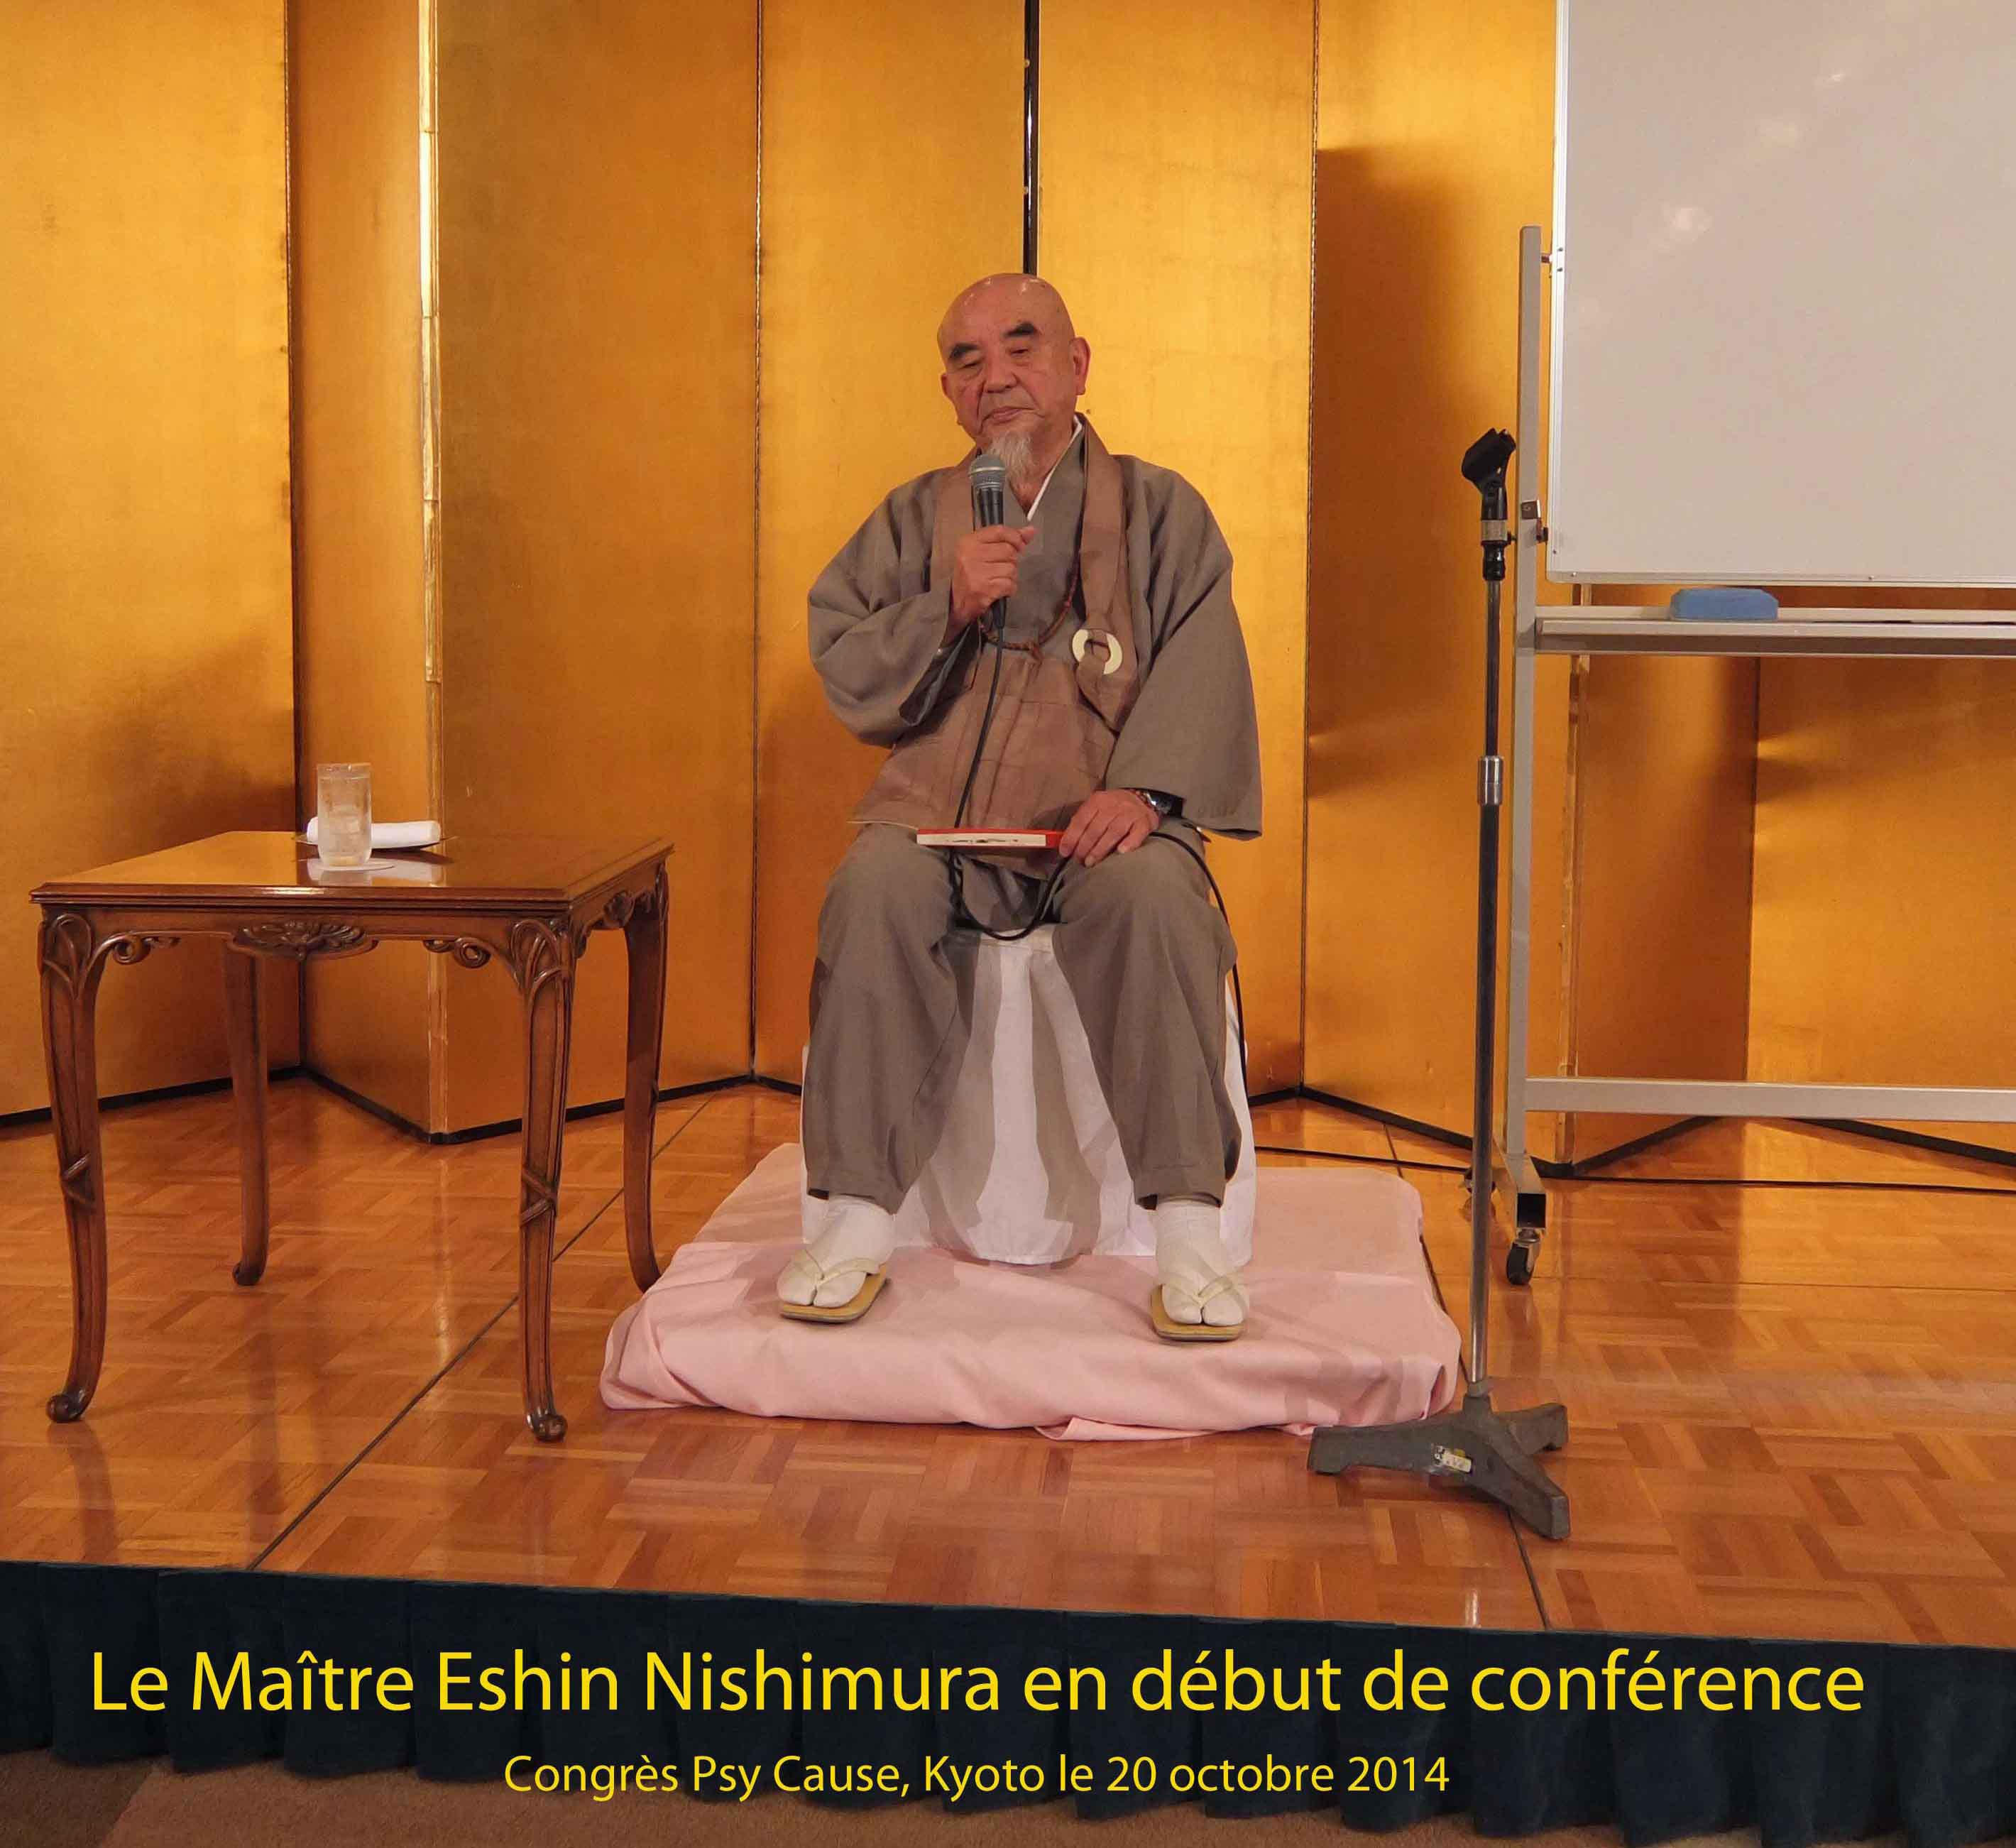 07-maitre-eshin-nishimura